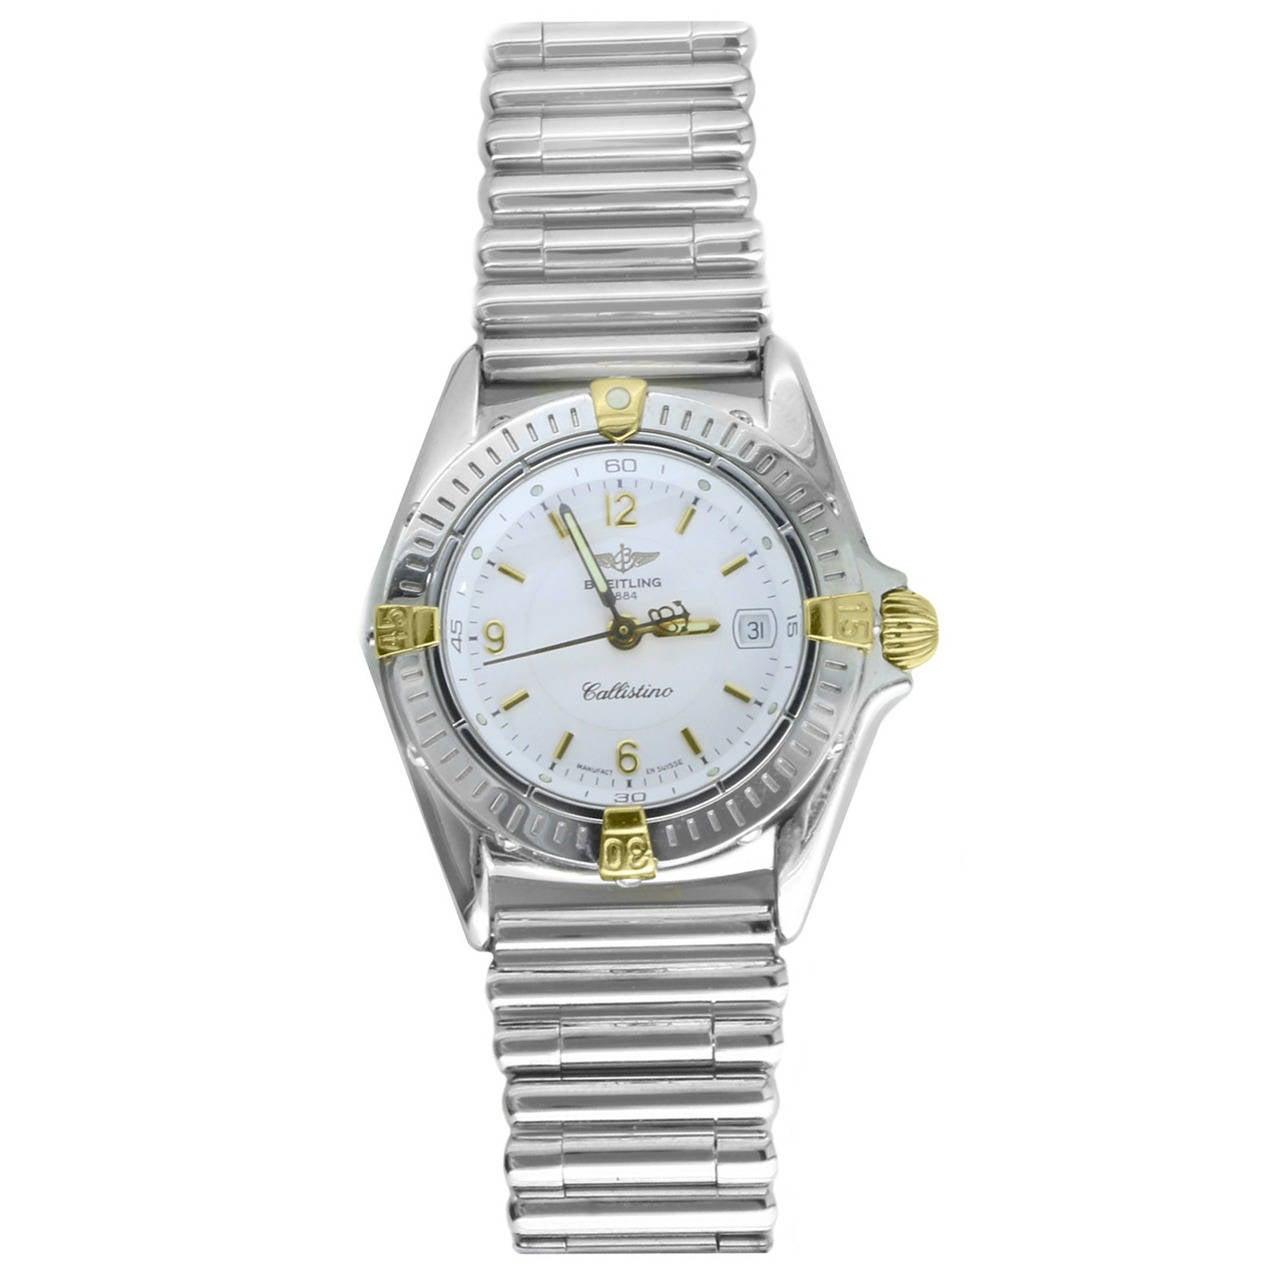 Breitling Lady's Yellow Gold Stainless Steel Callistino Wristwatch Ref B52045